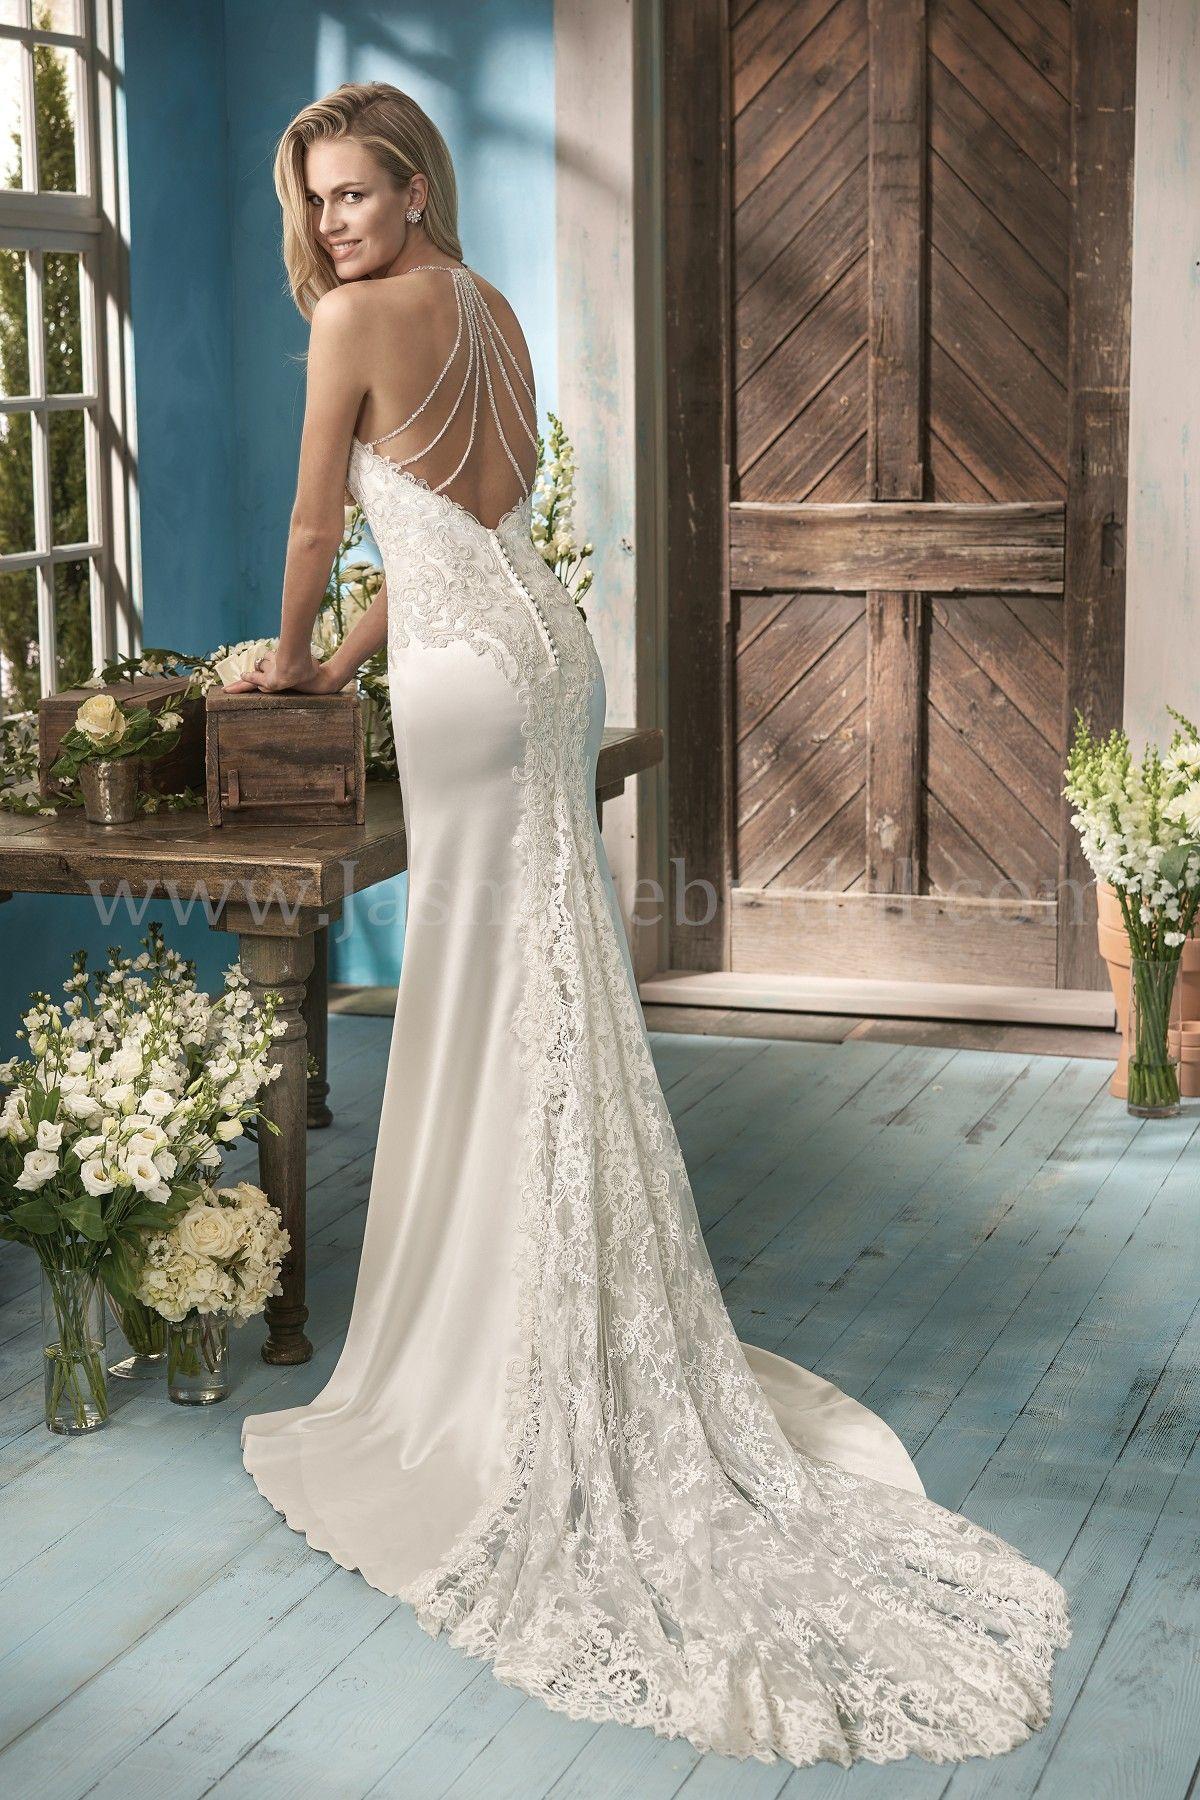 Pin On Grecian Goddess Greece Destination Wedding Inspiration